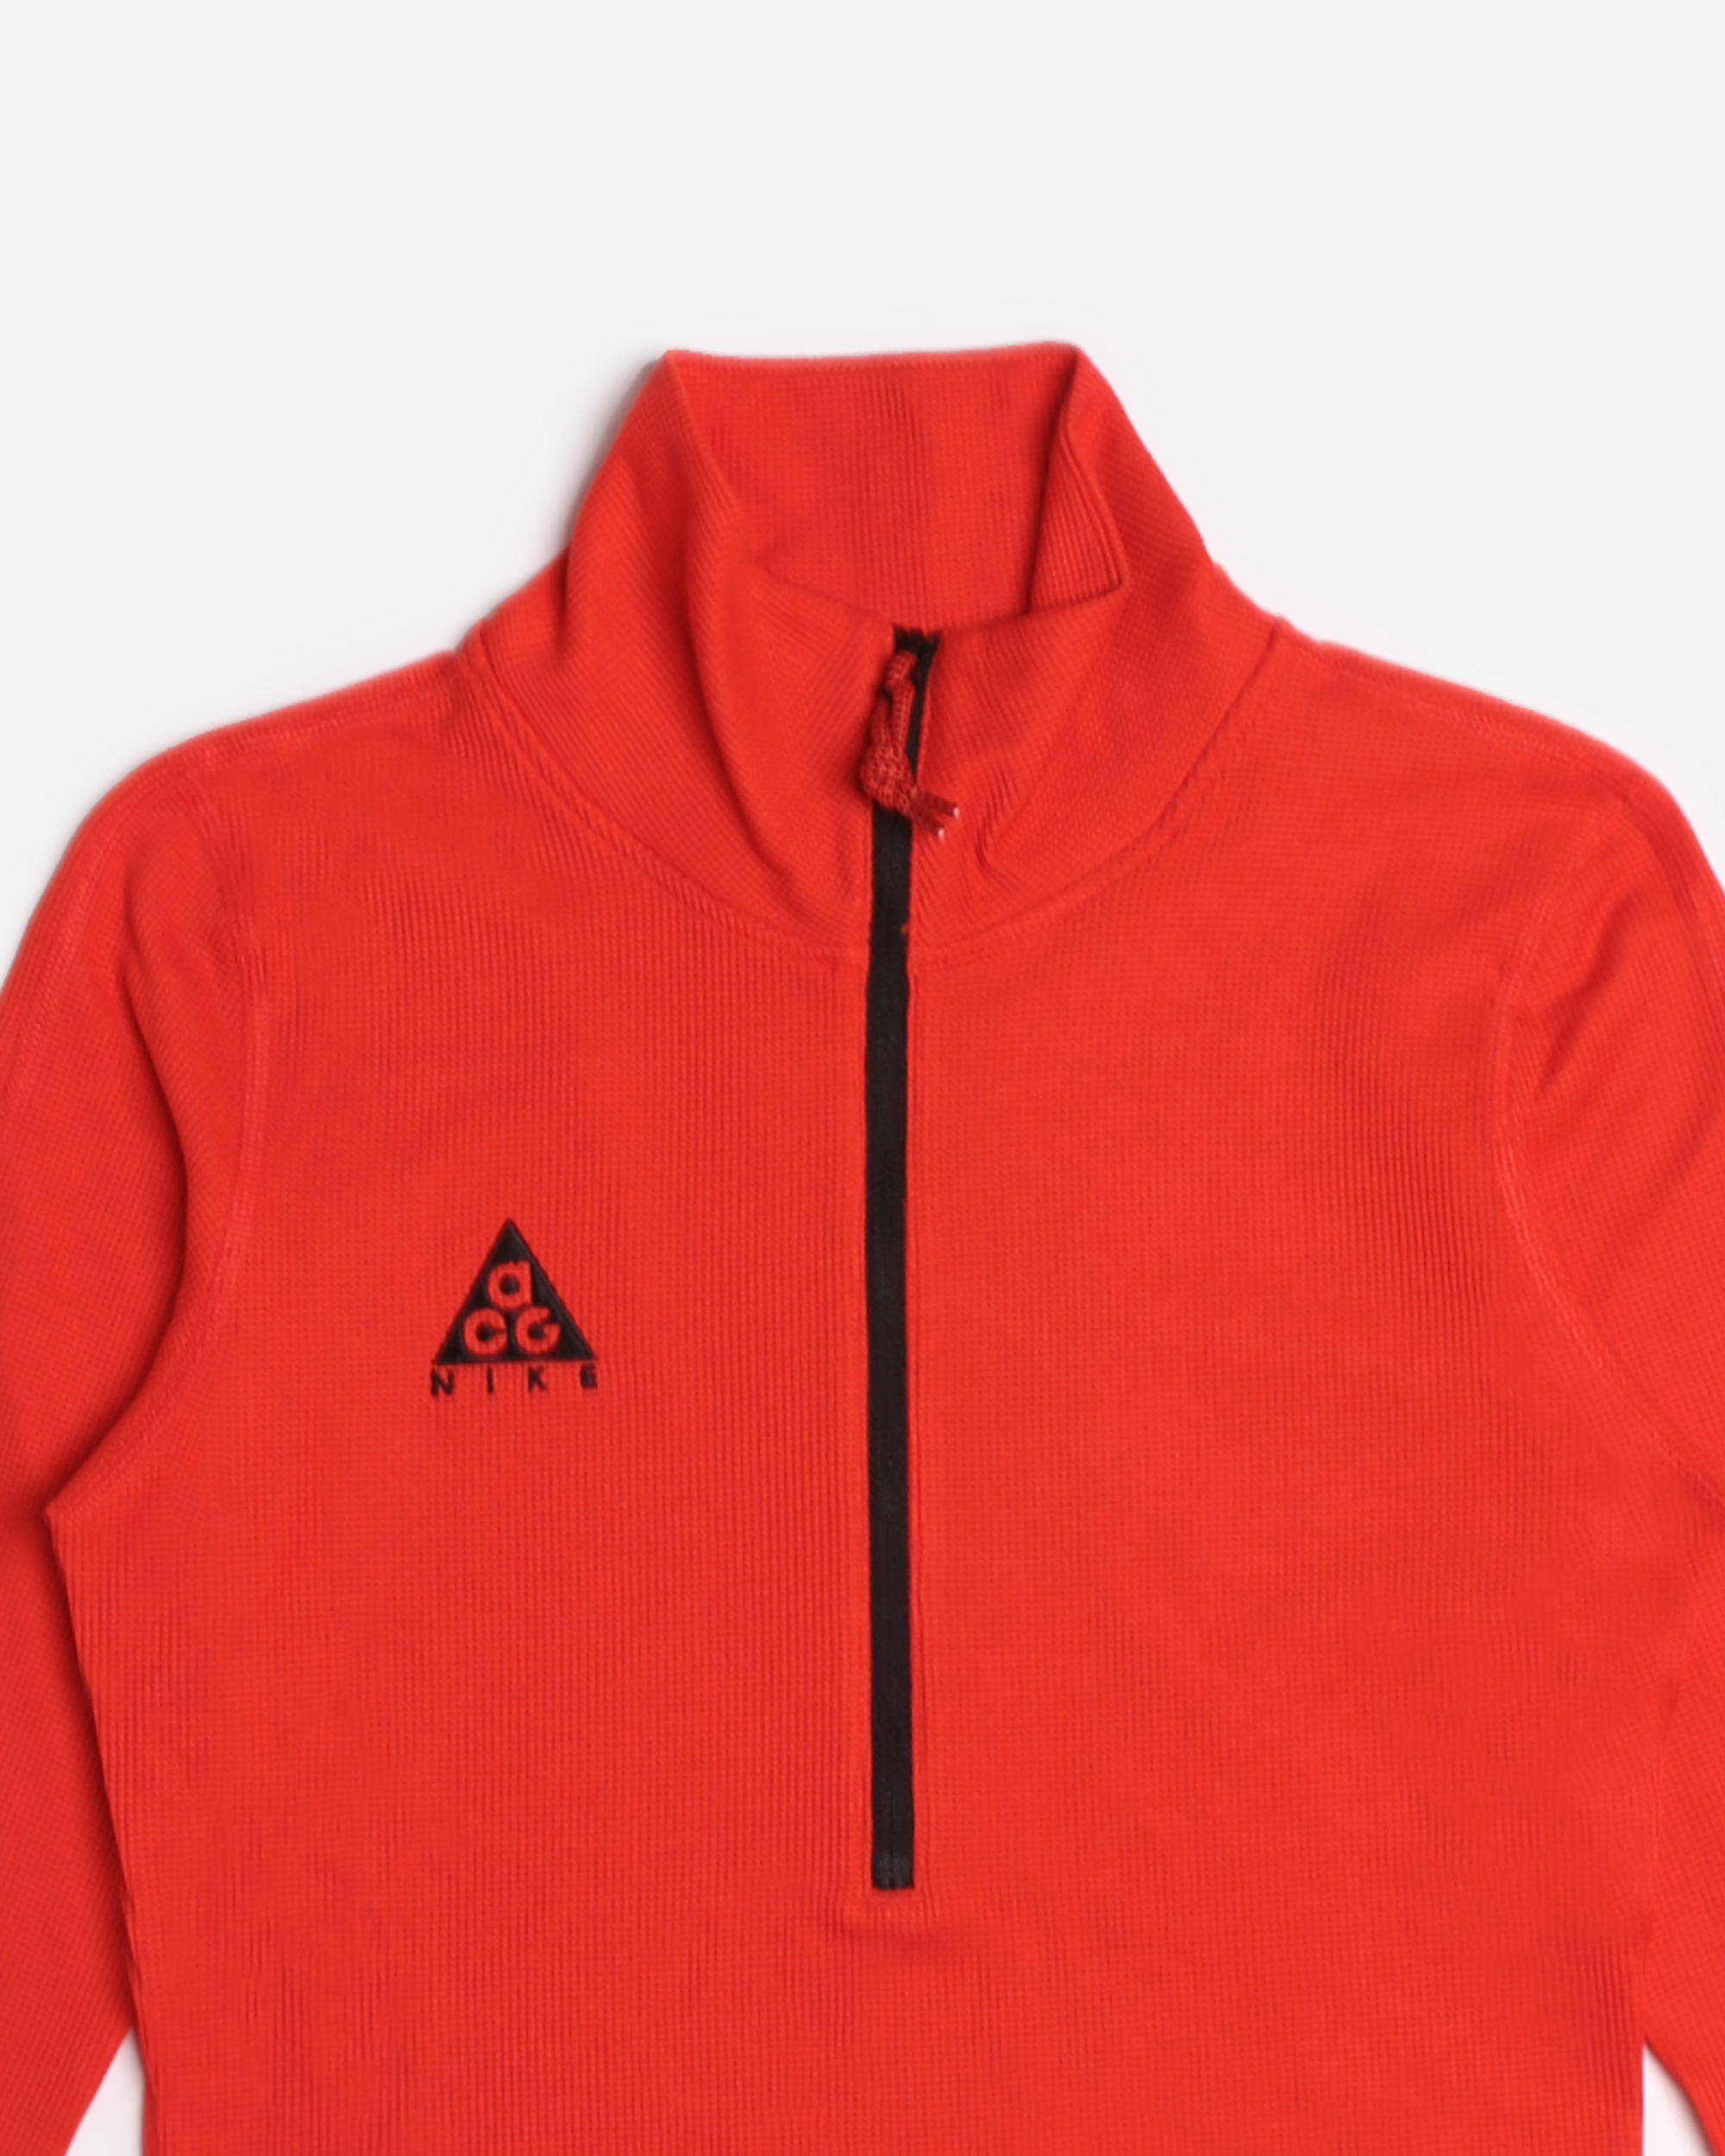 Nike Sportswear Nike ACG LS Thermal Top Habanero Red/Black